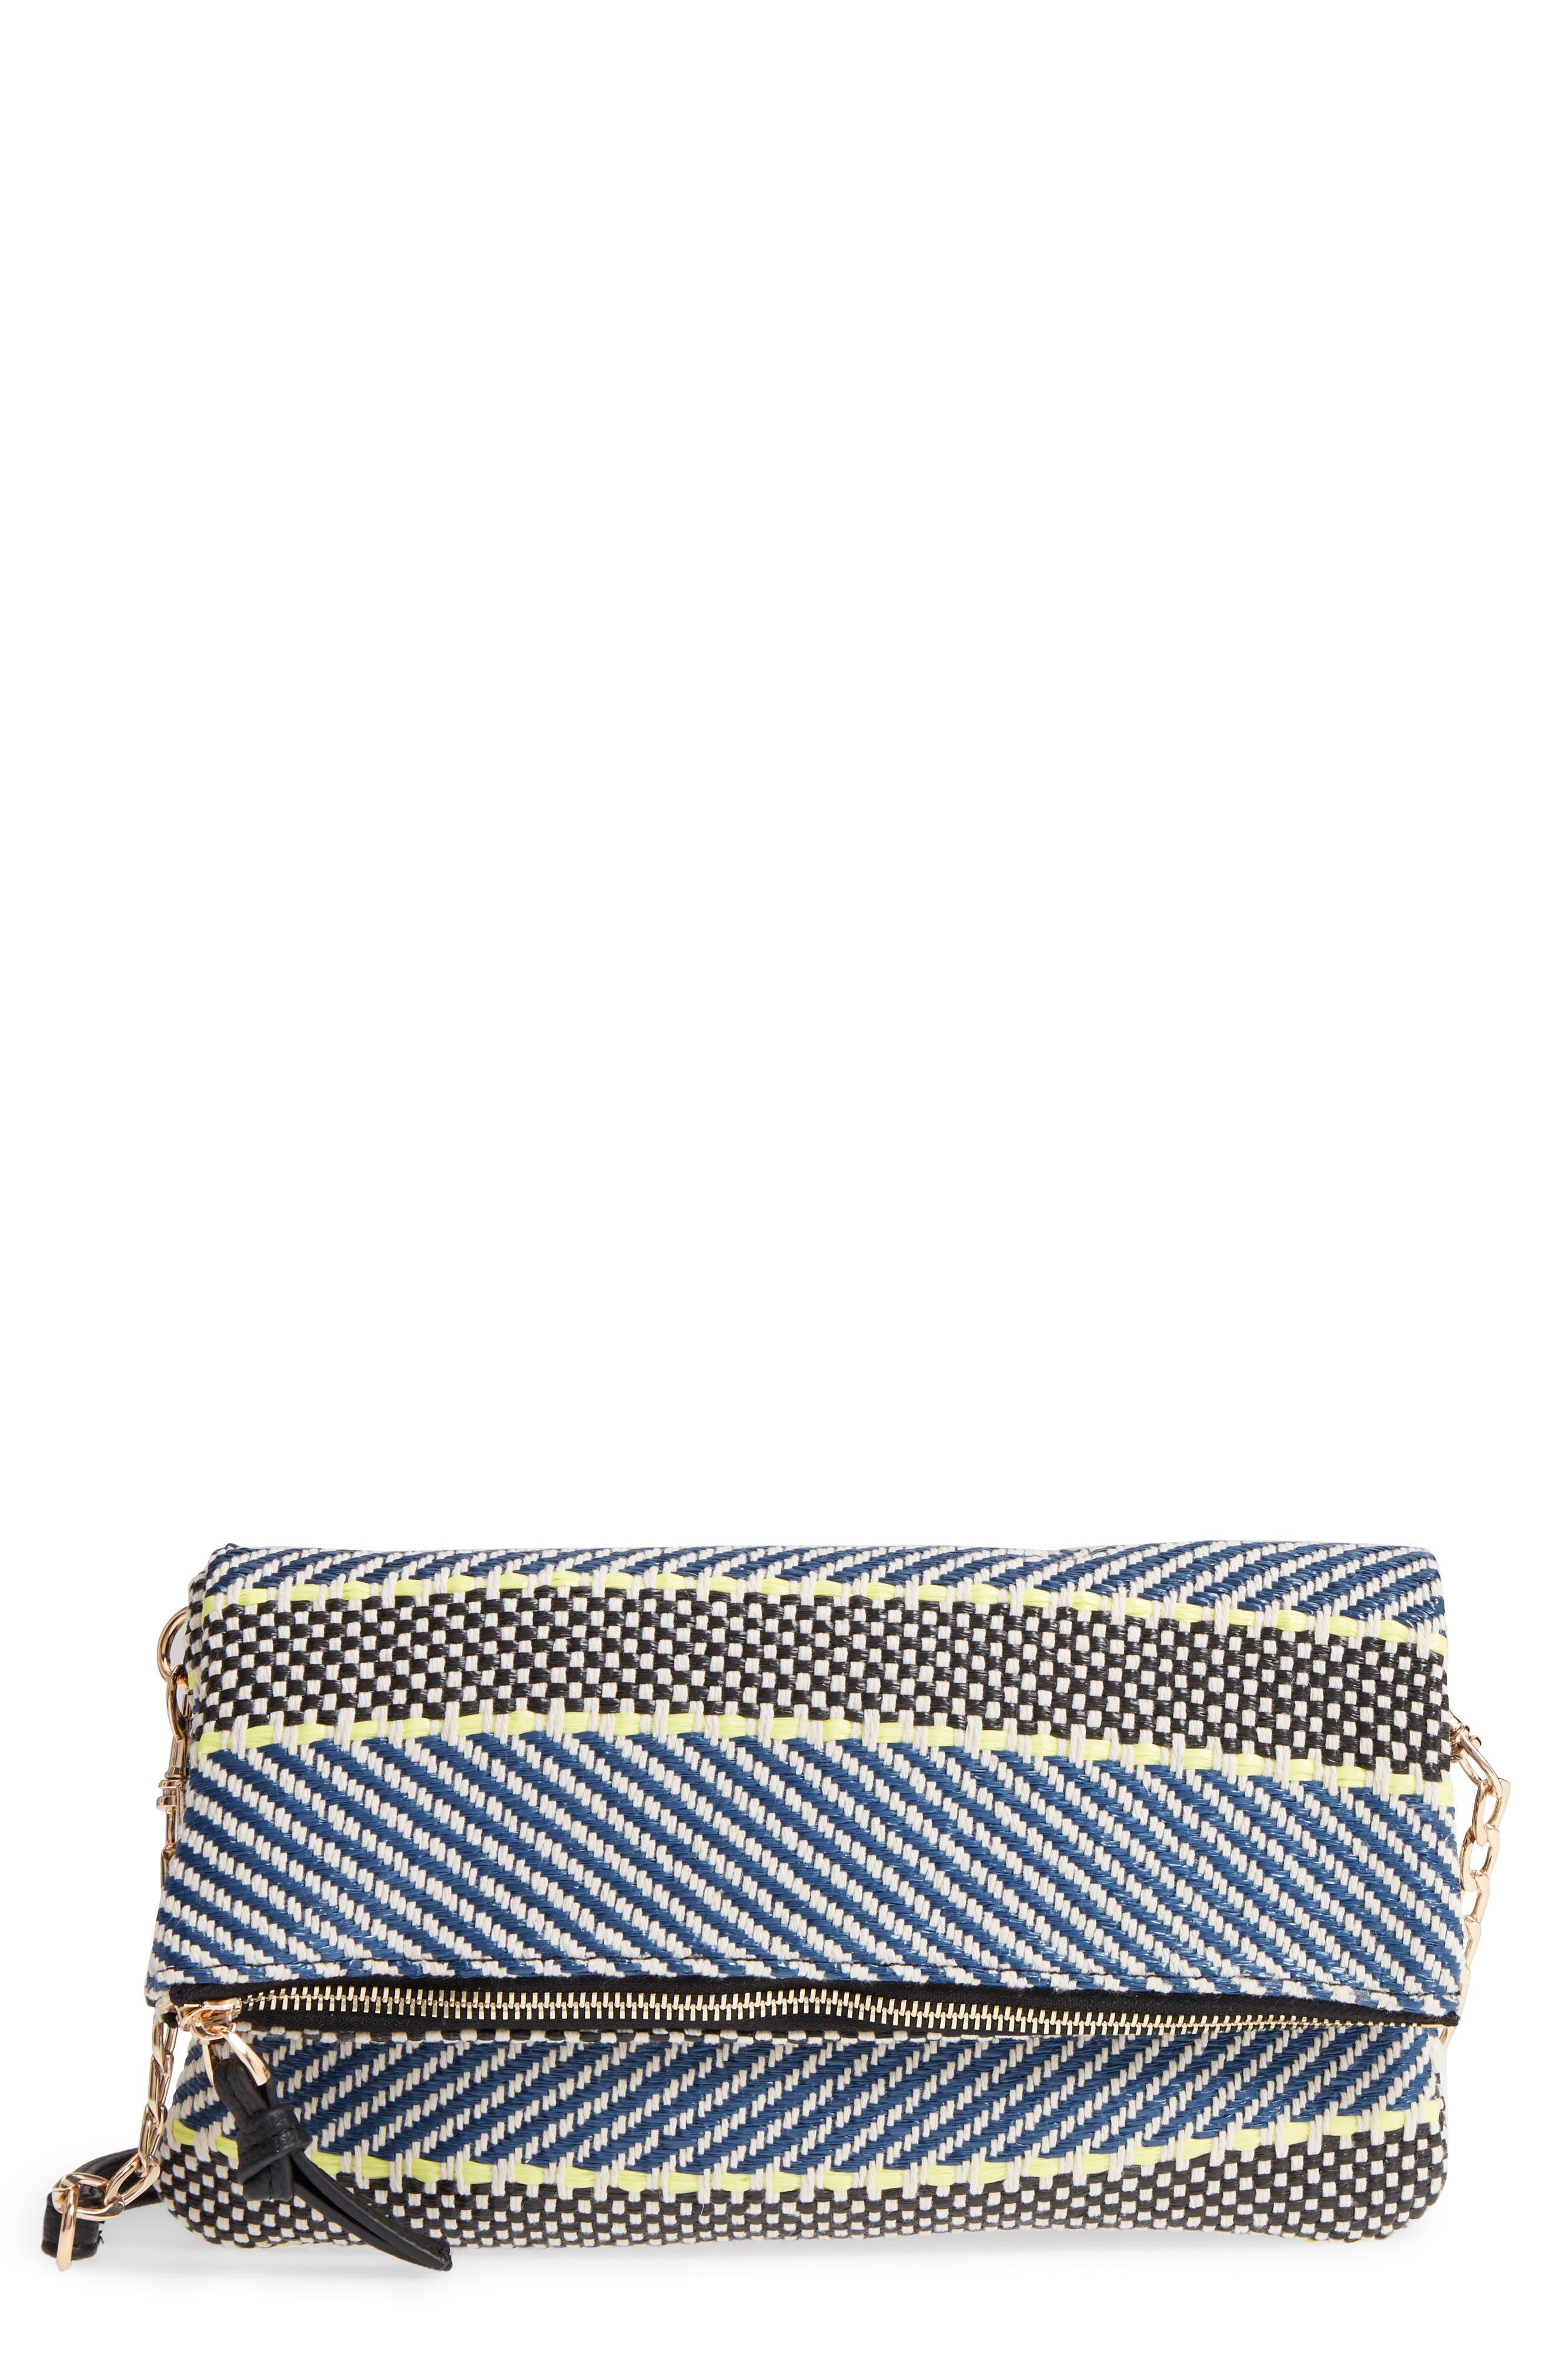 Medina Fabric Foldover Clutch,                             Main thumbnail 1, color,                             Navy/ Cream Combo